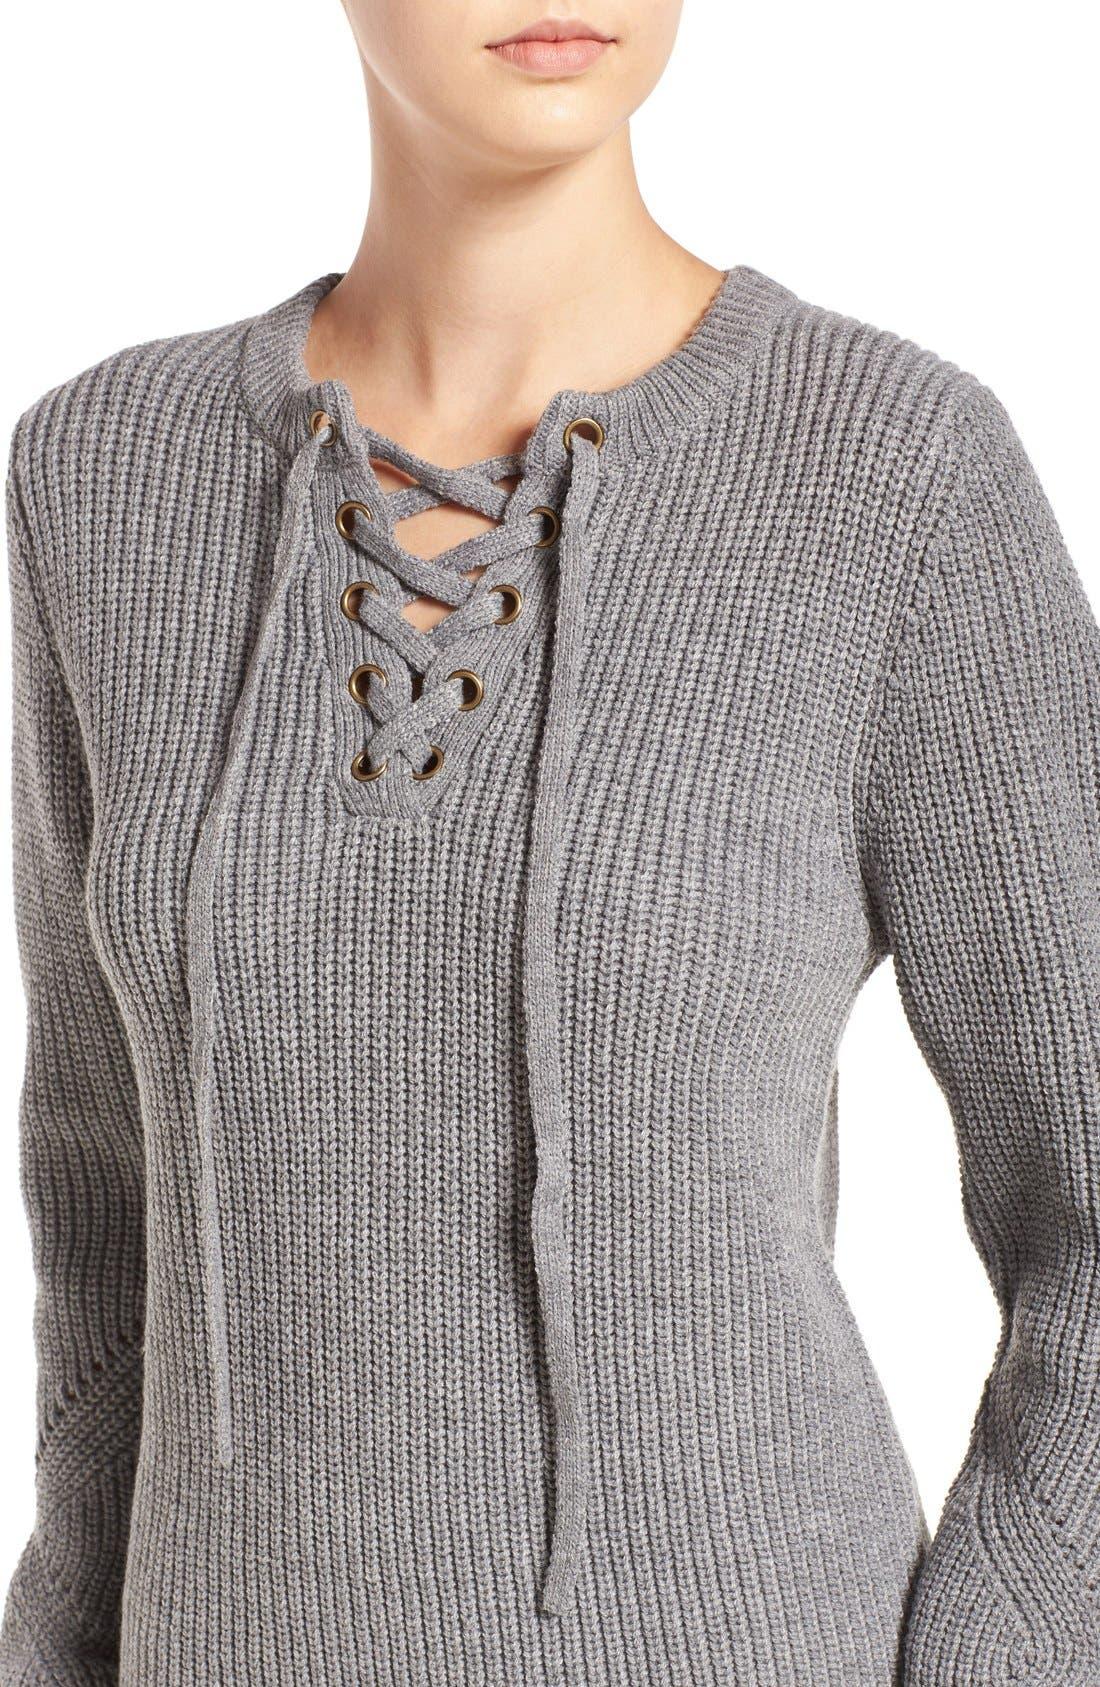 Alternate Image 4  - Elodie Rib Knit Lace-Up Sweater